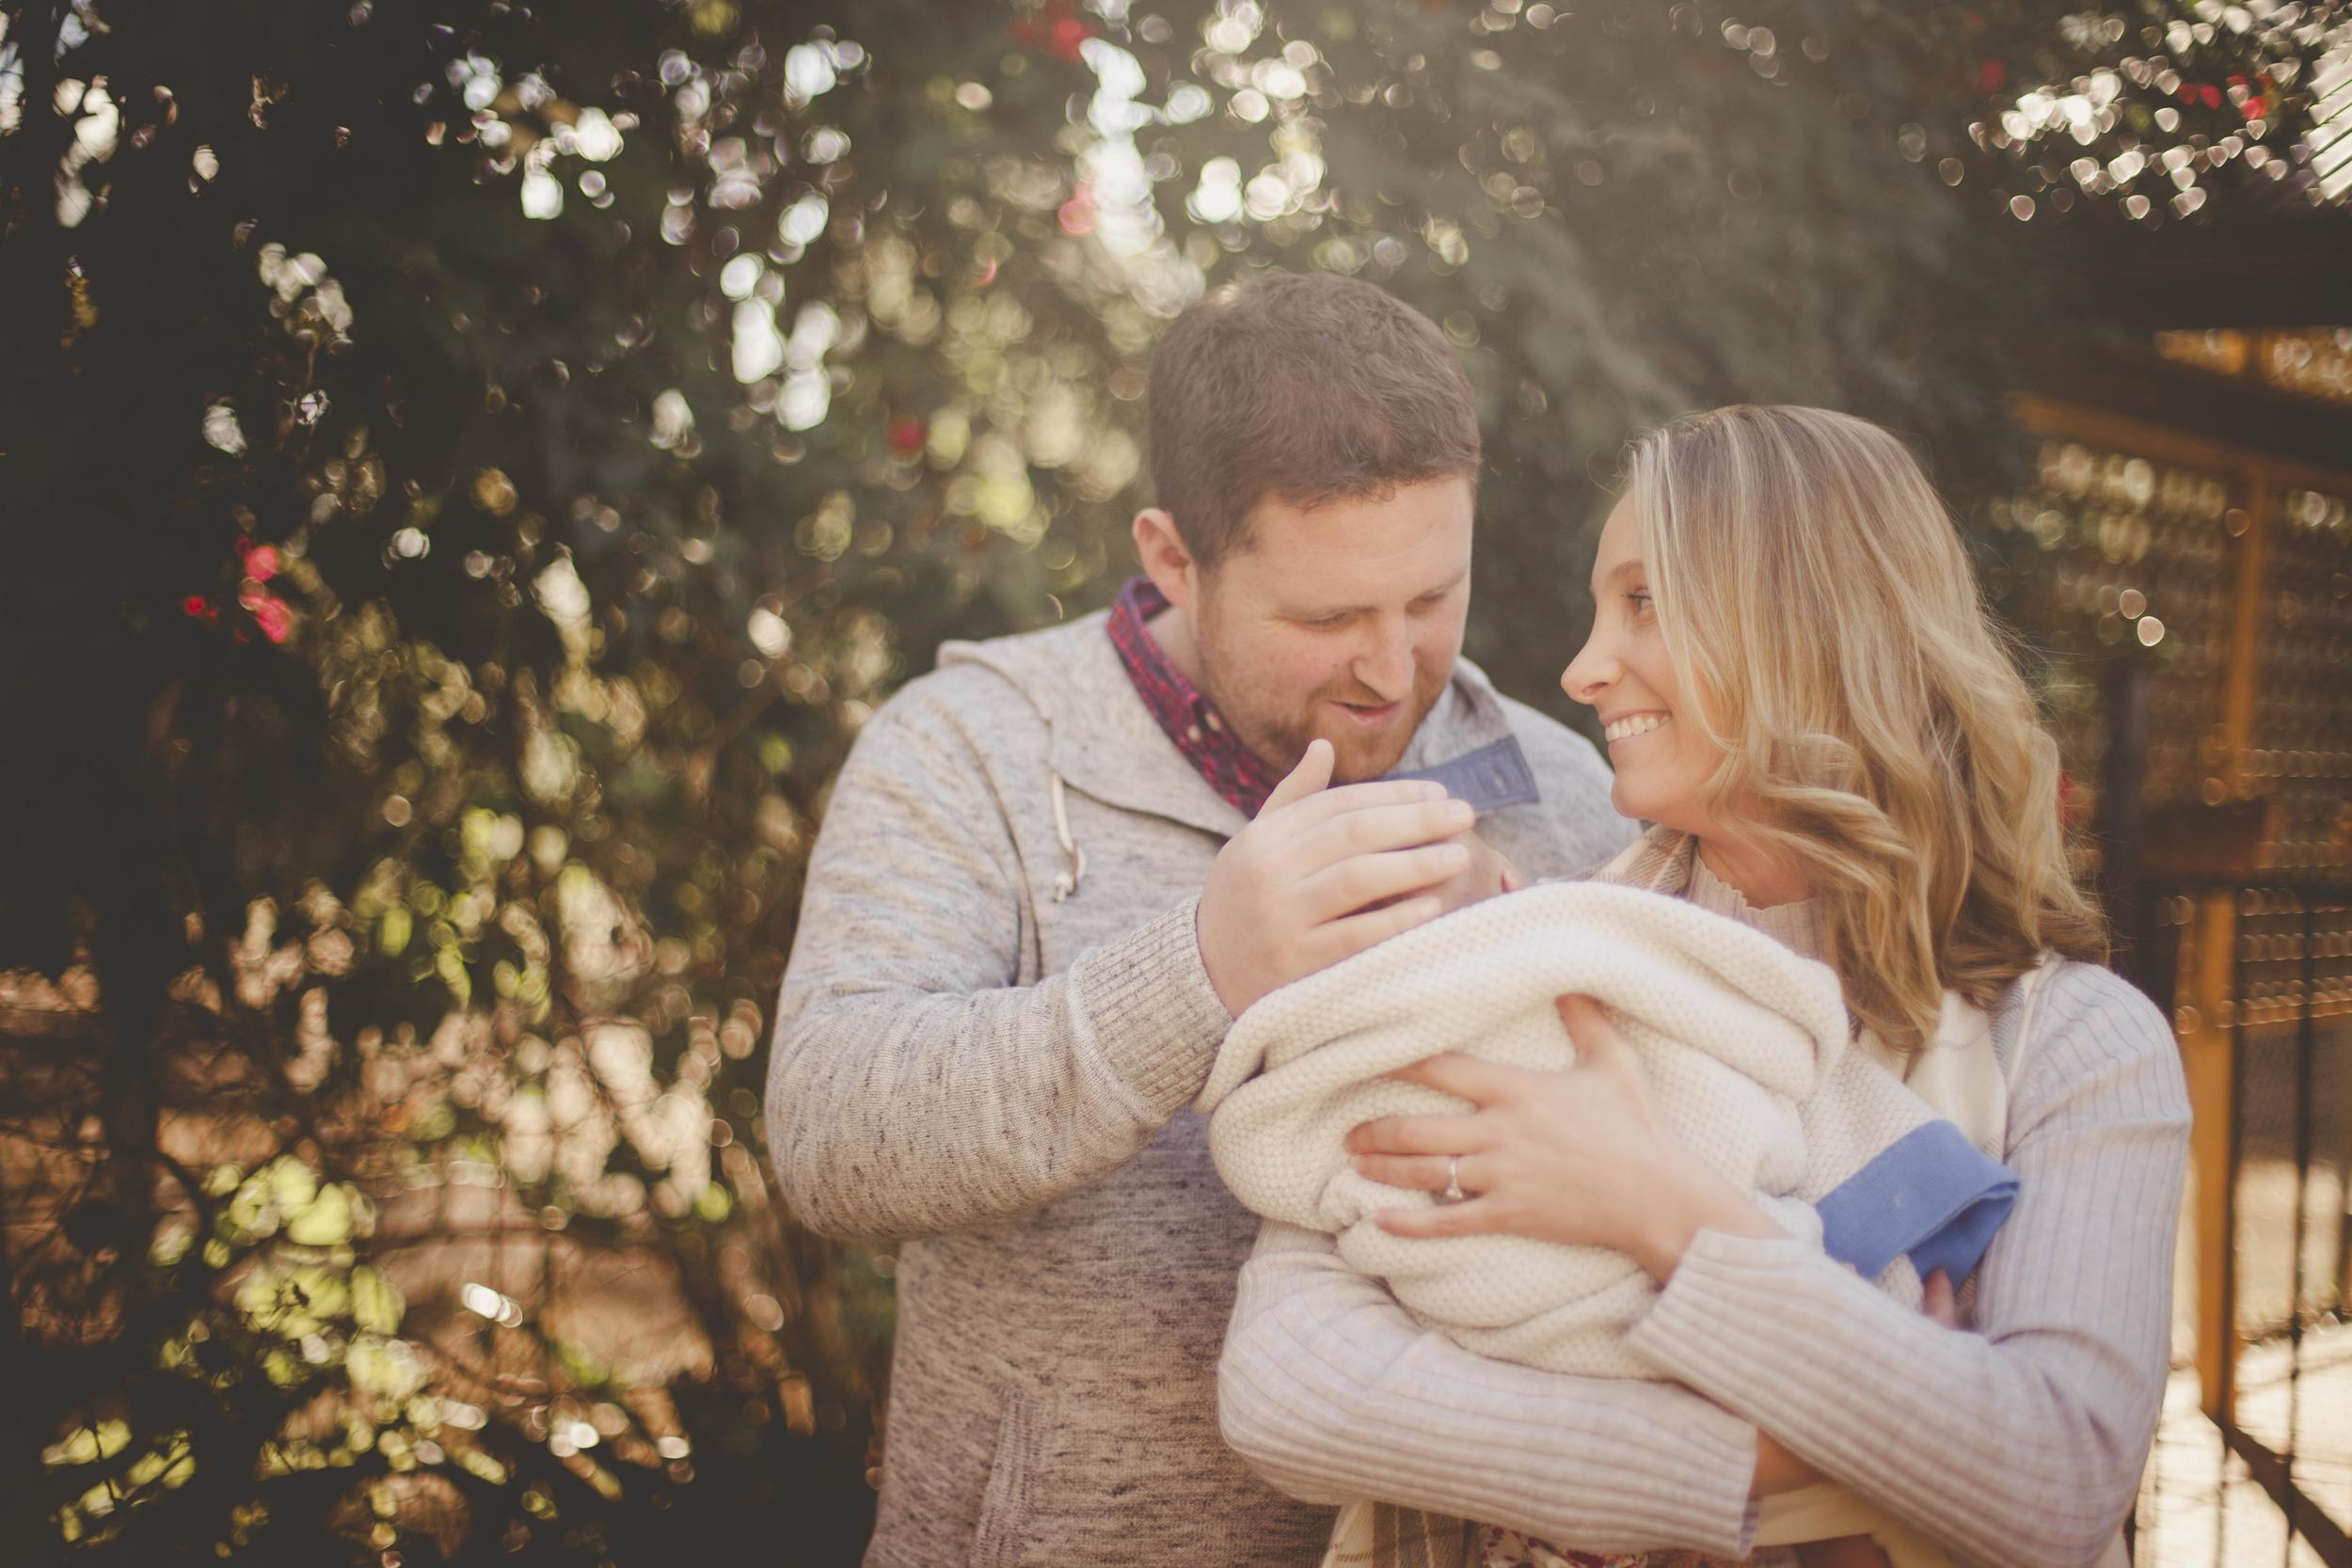 parents smiling at newborn